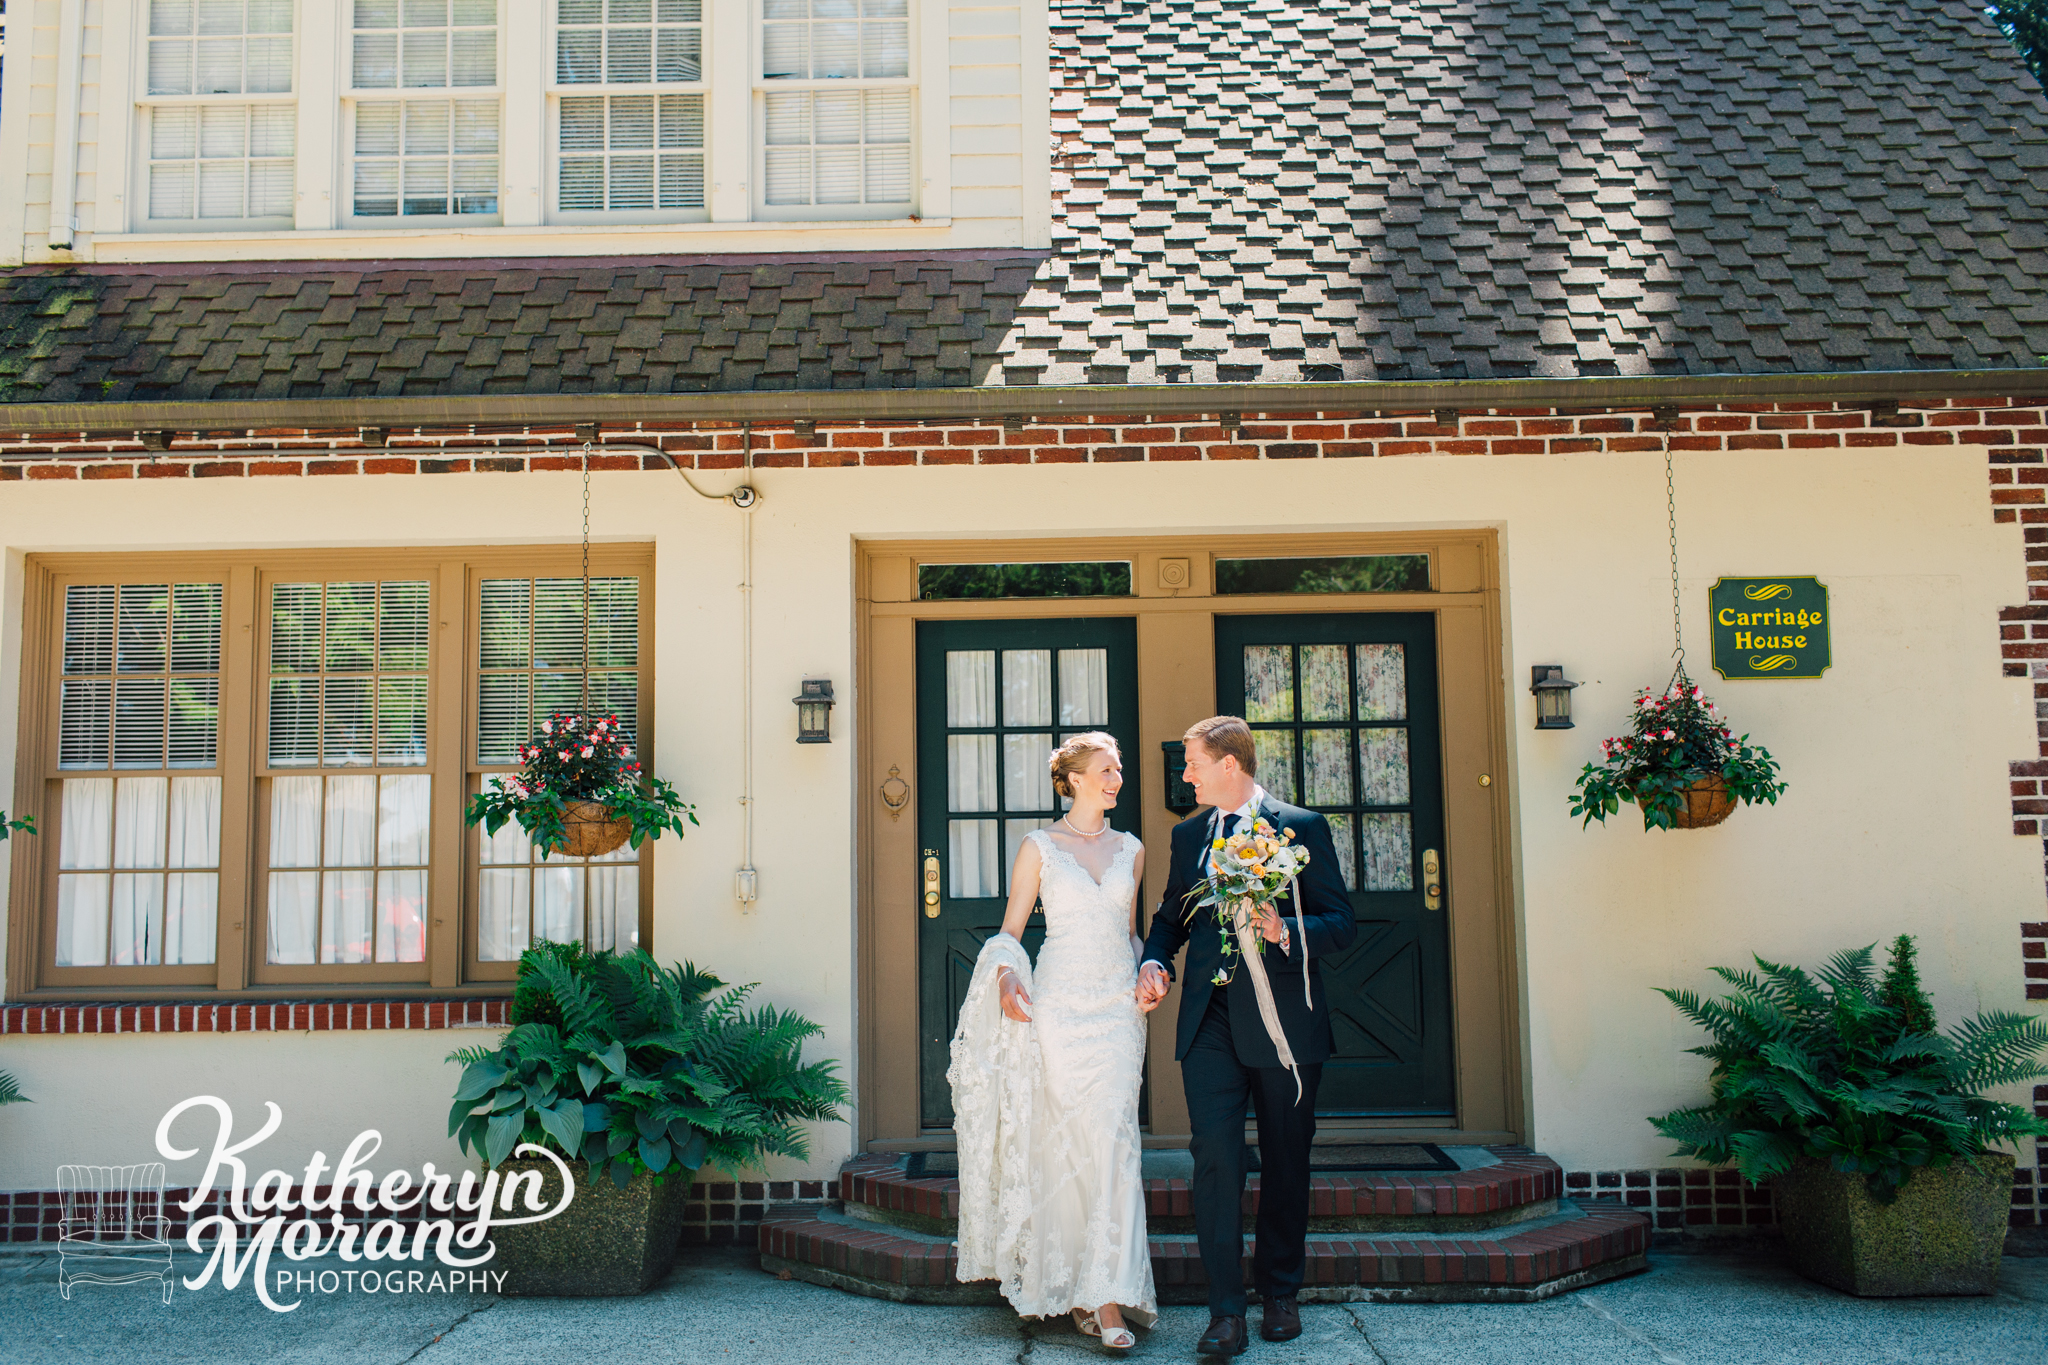 bellingham-wedding-photographer-lairmont-manor-katheryn-moran-5.jpg